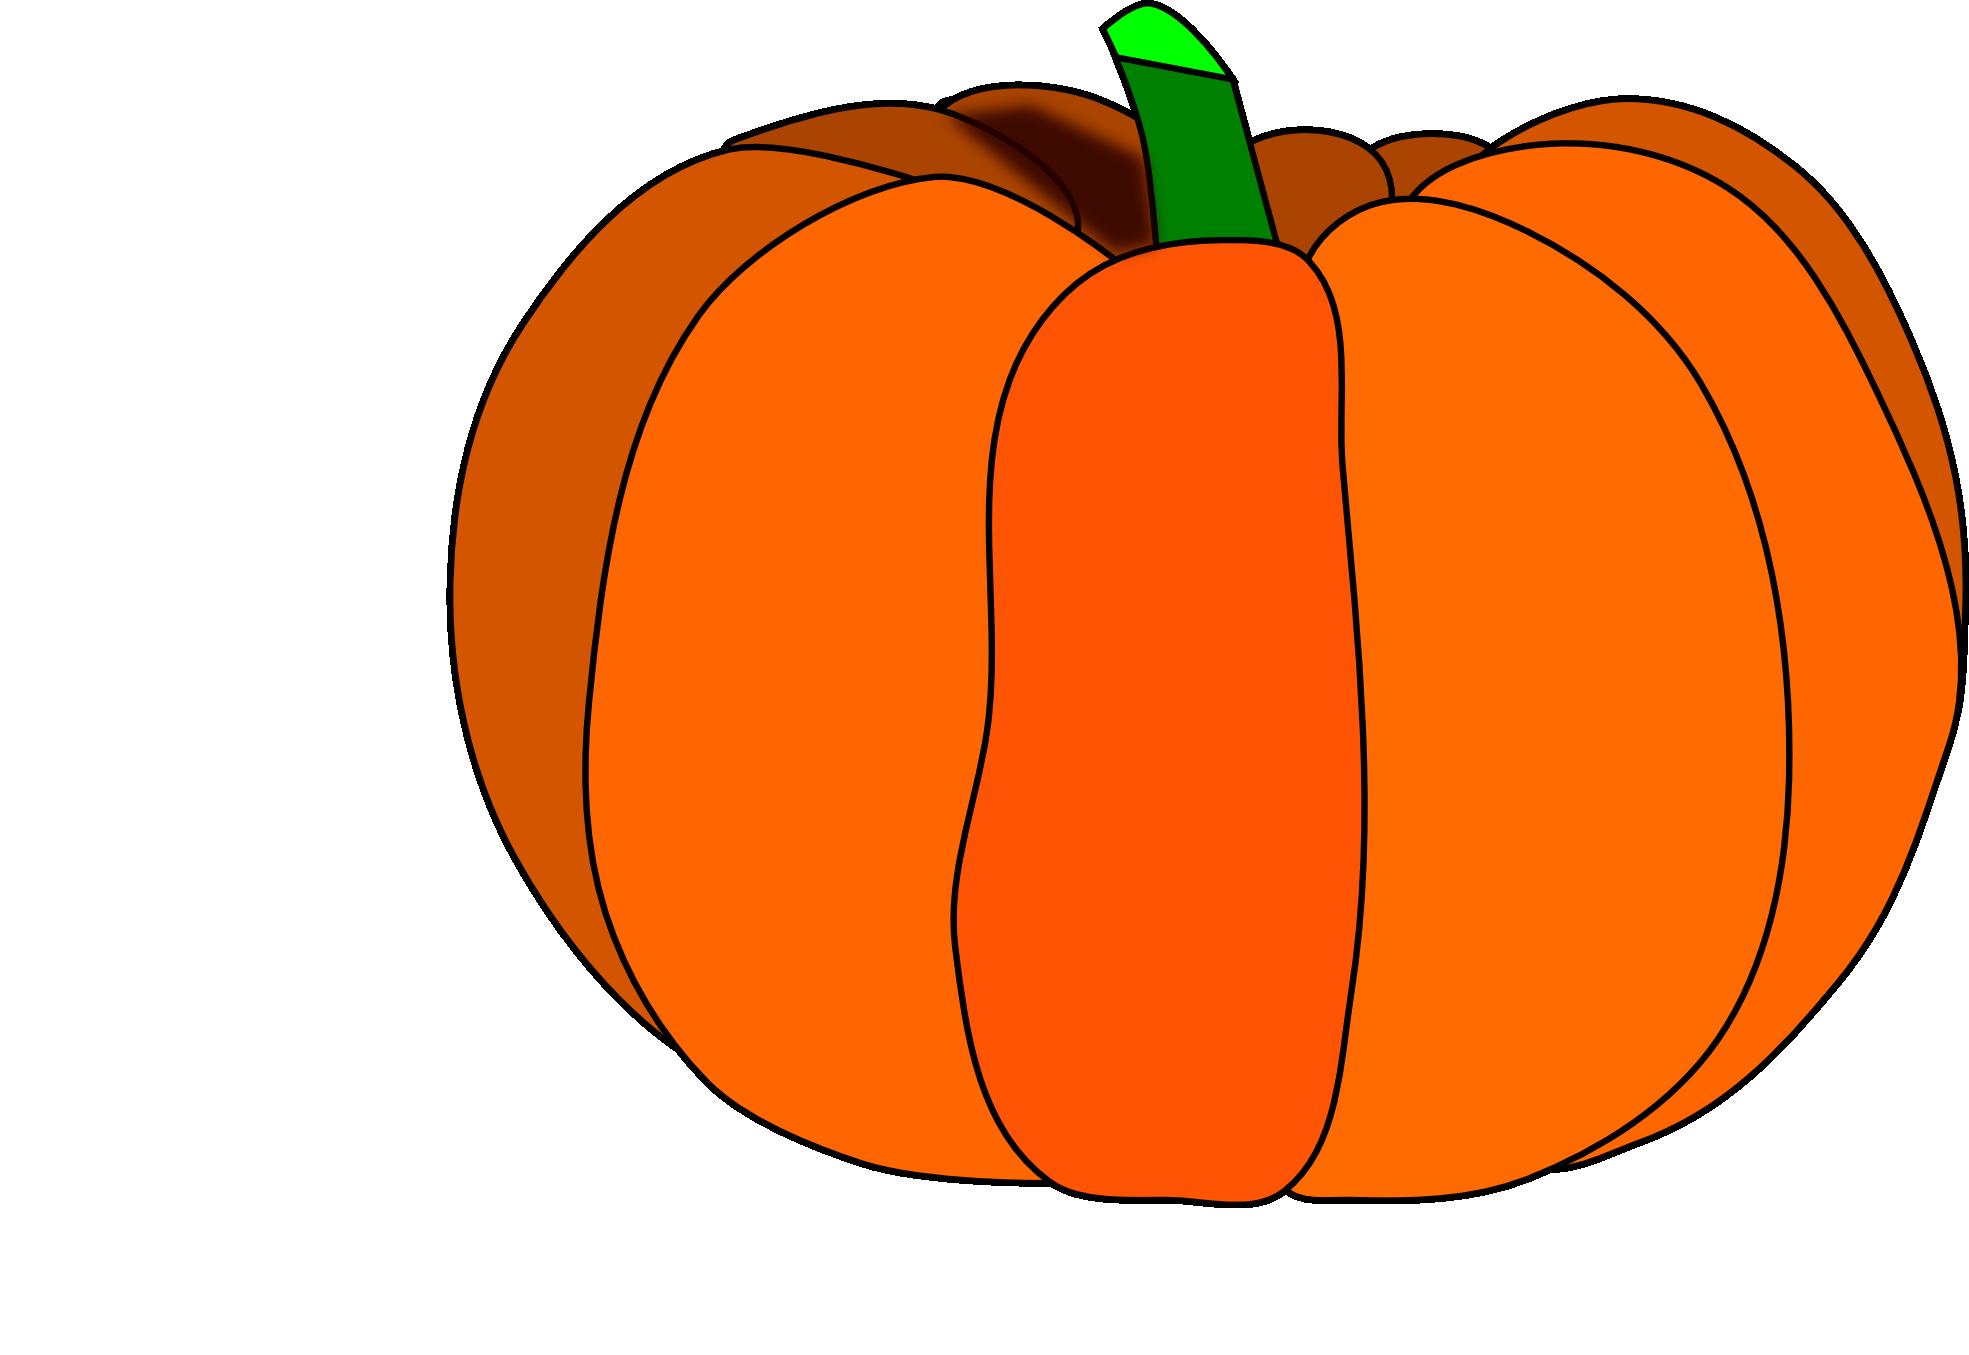 Food pumpkin